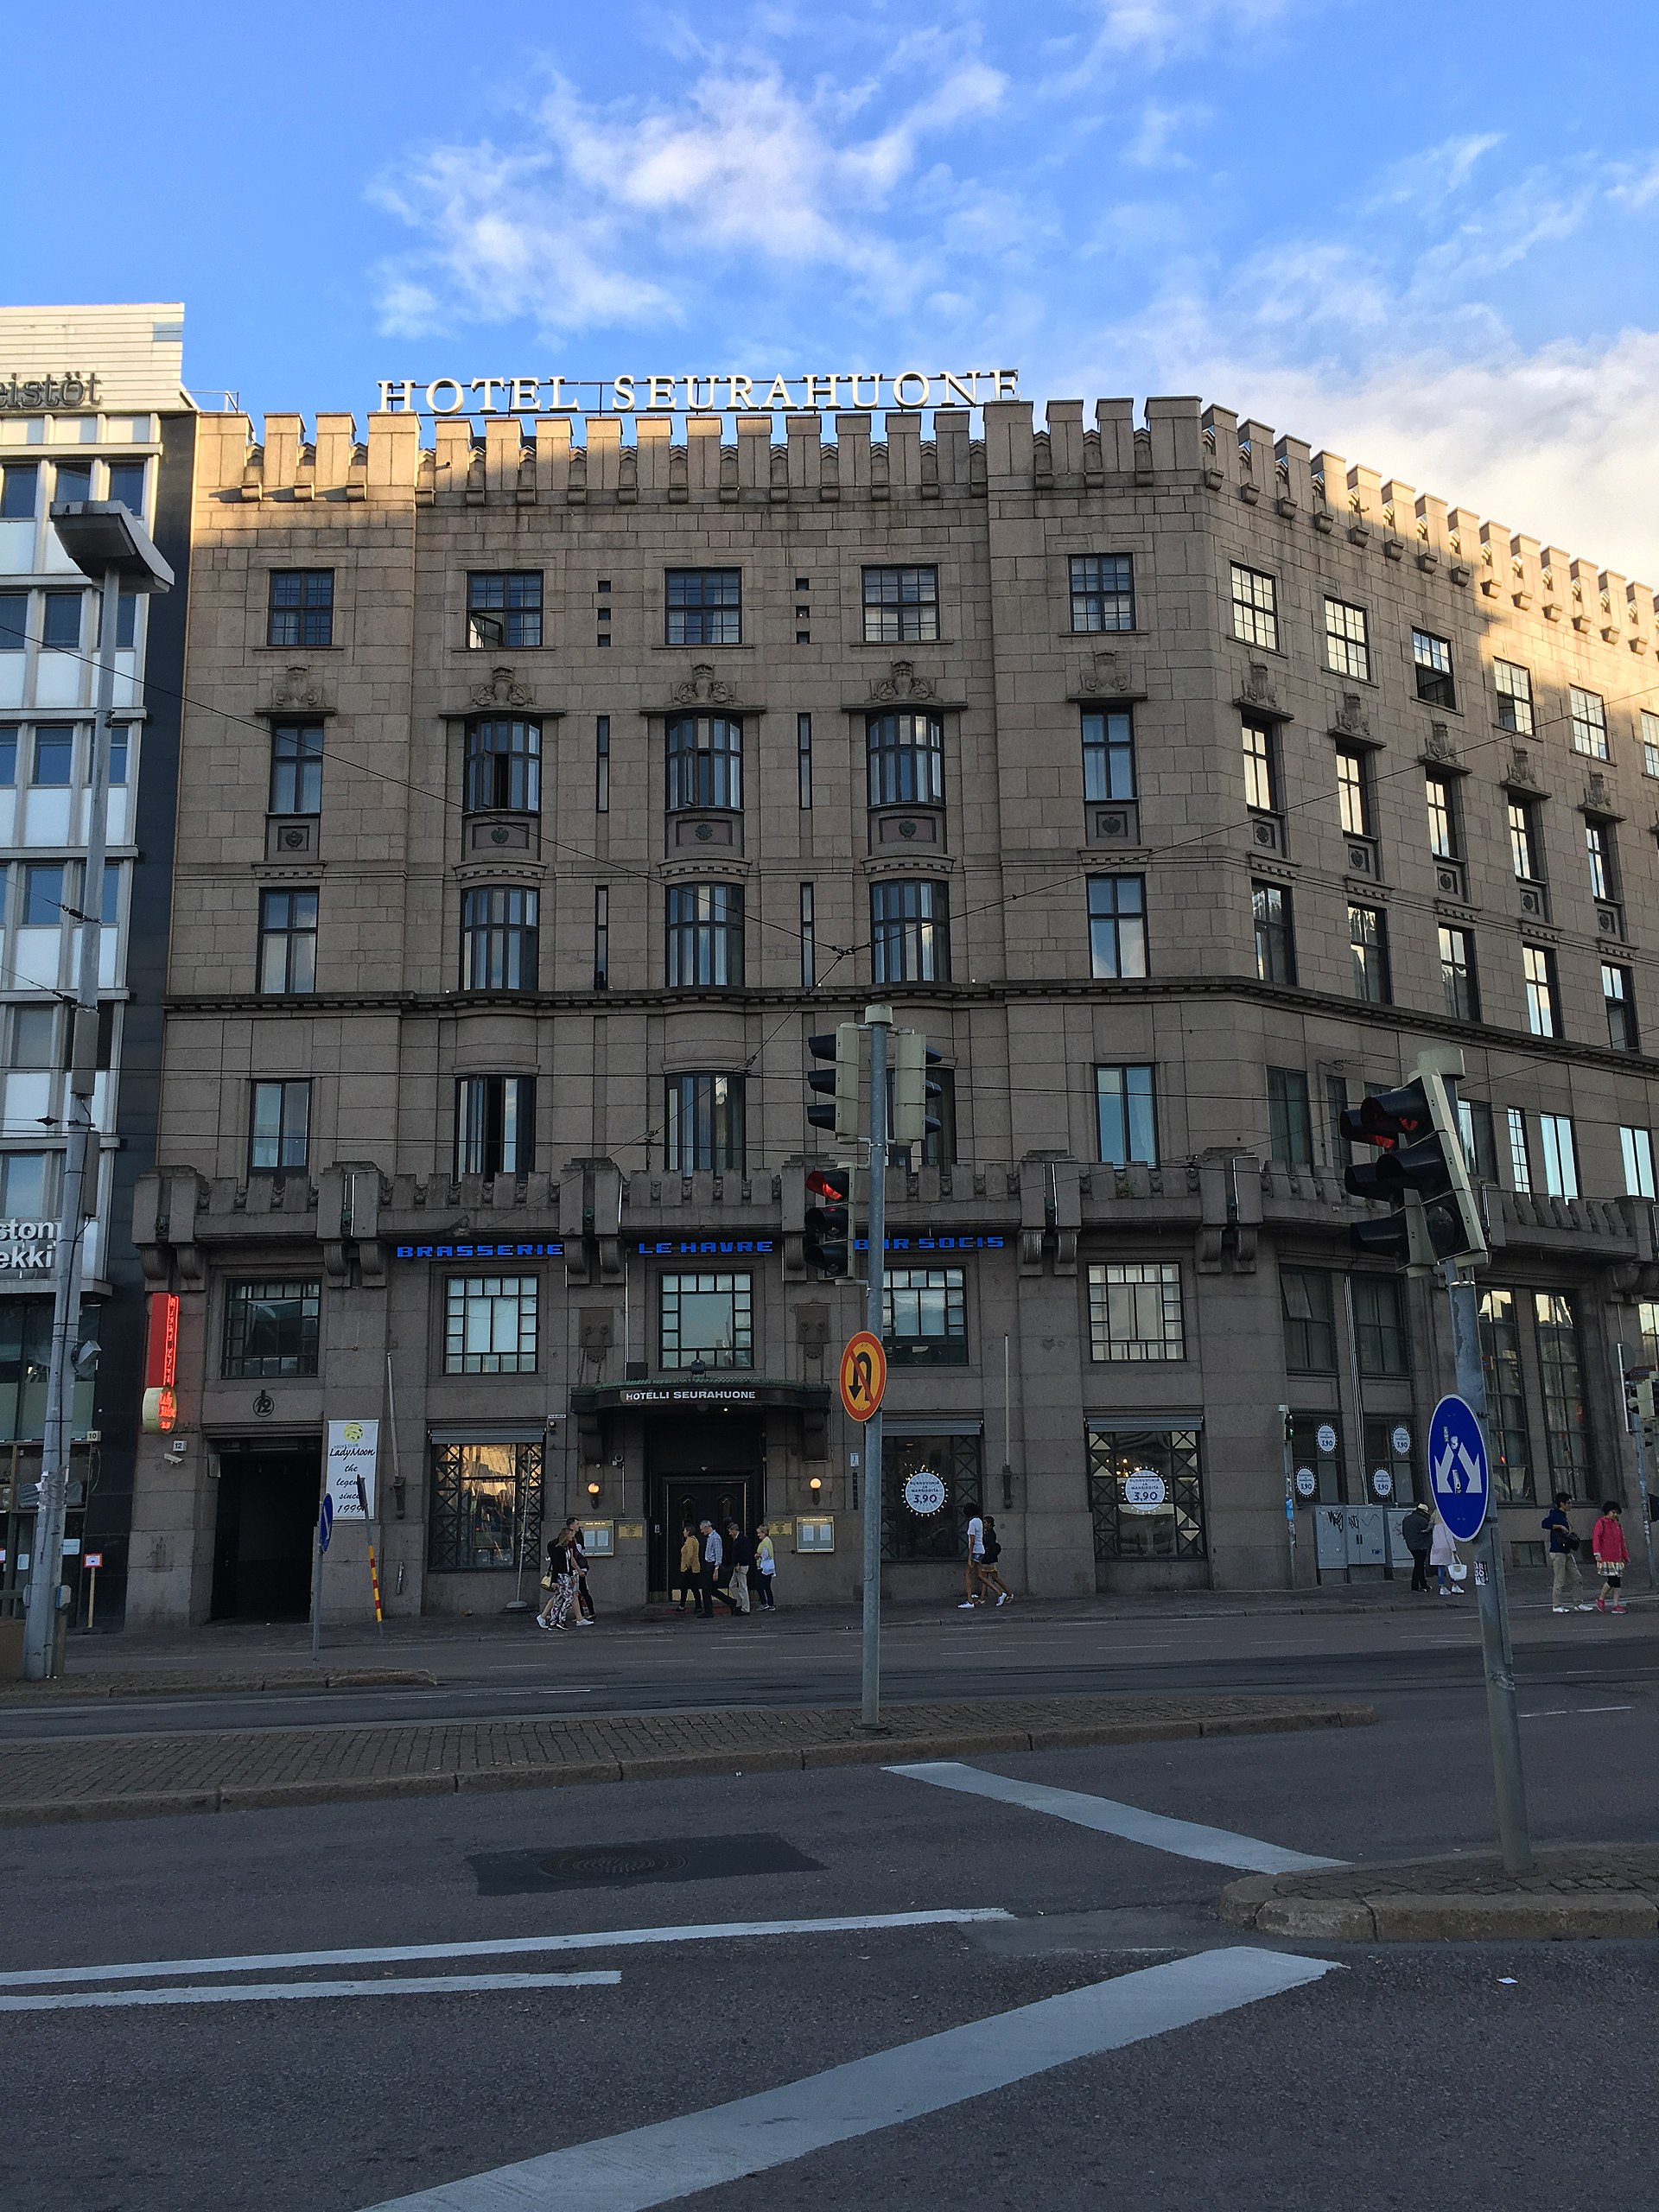 Hotelli Seurahuone Helsinki Wikipedia